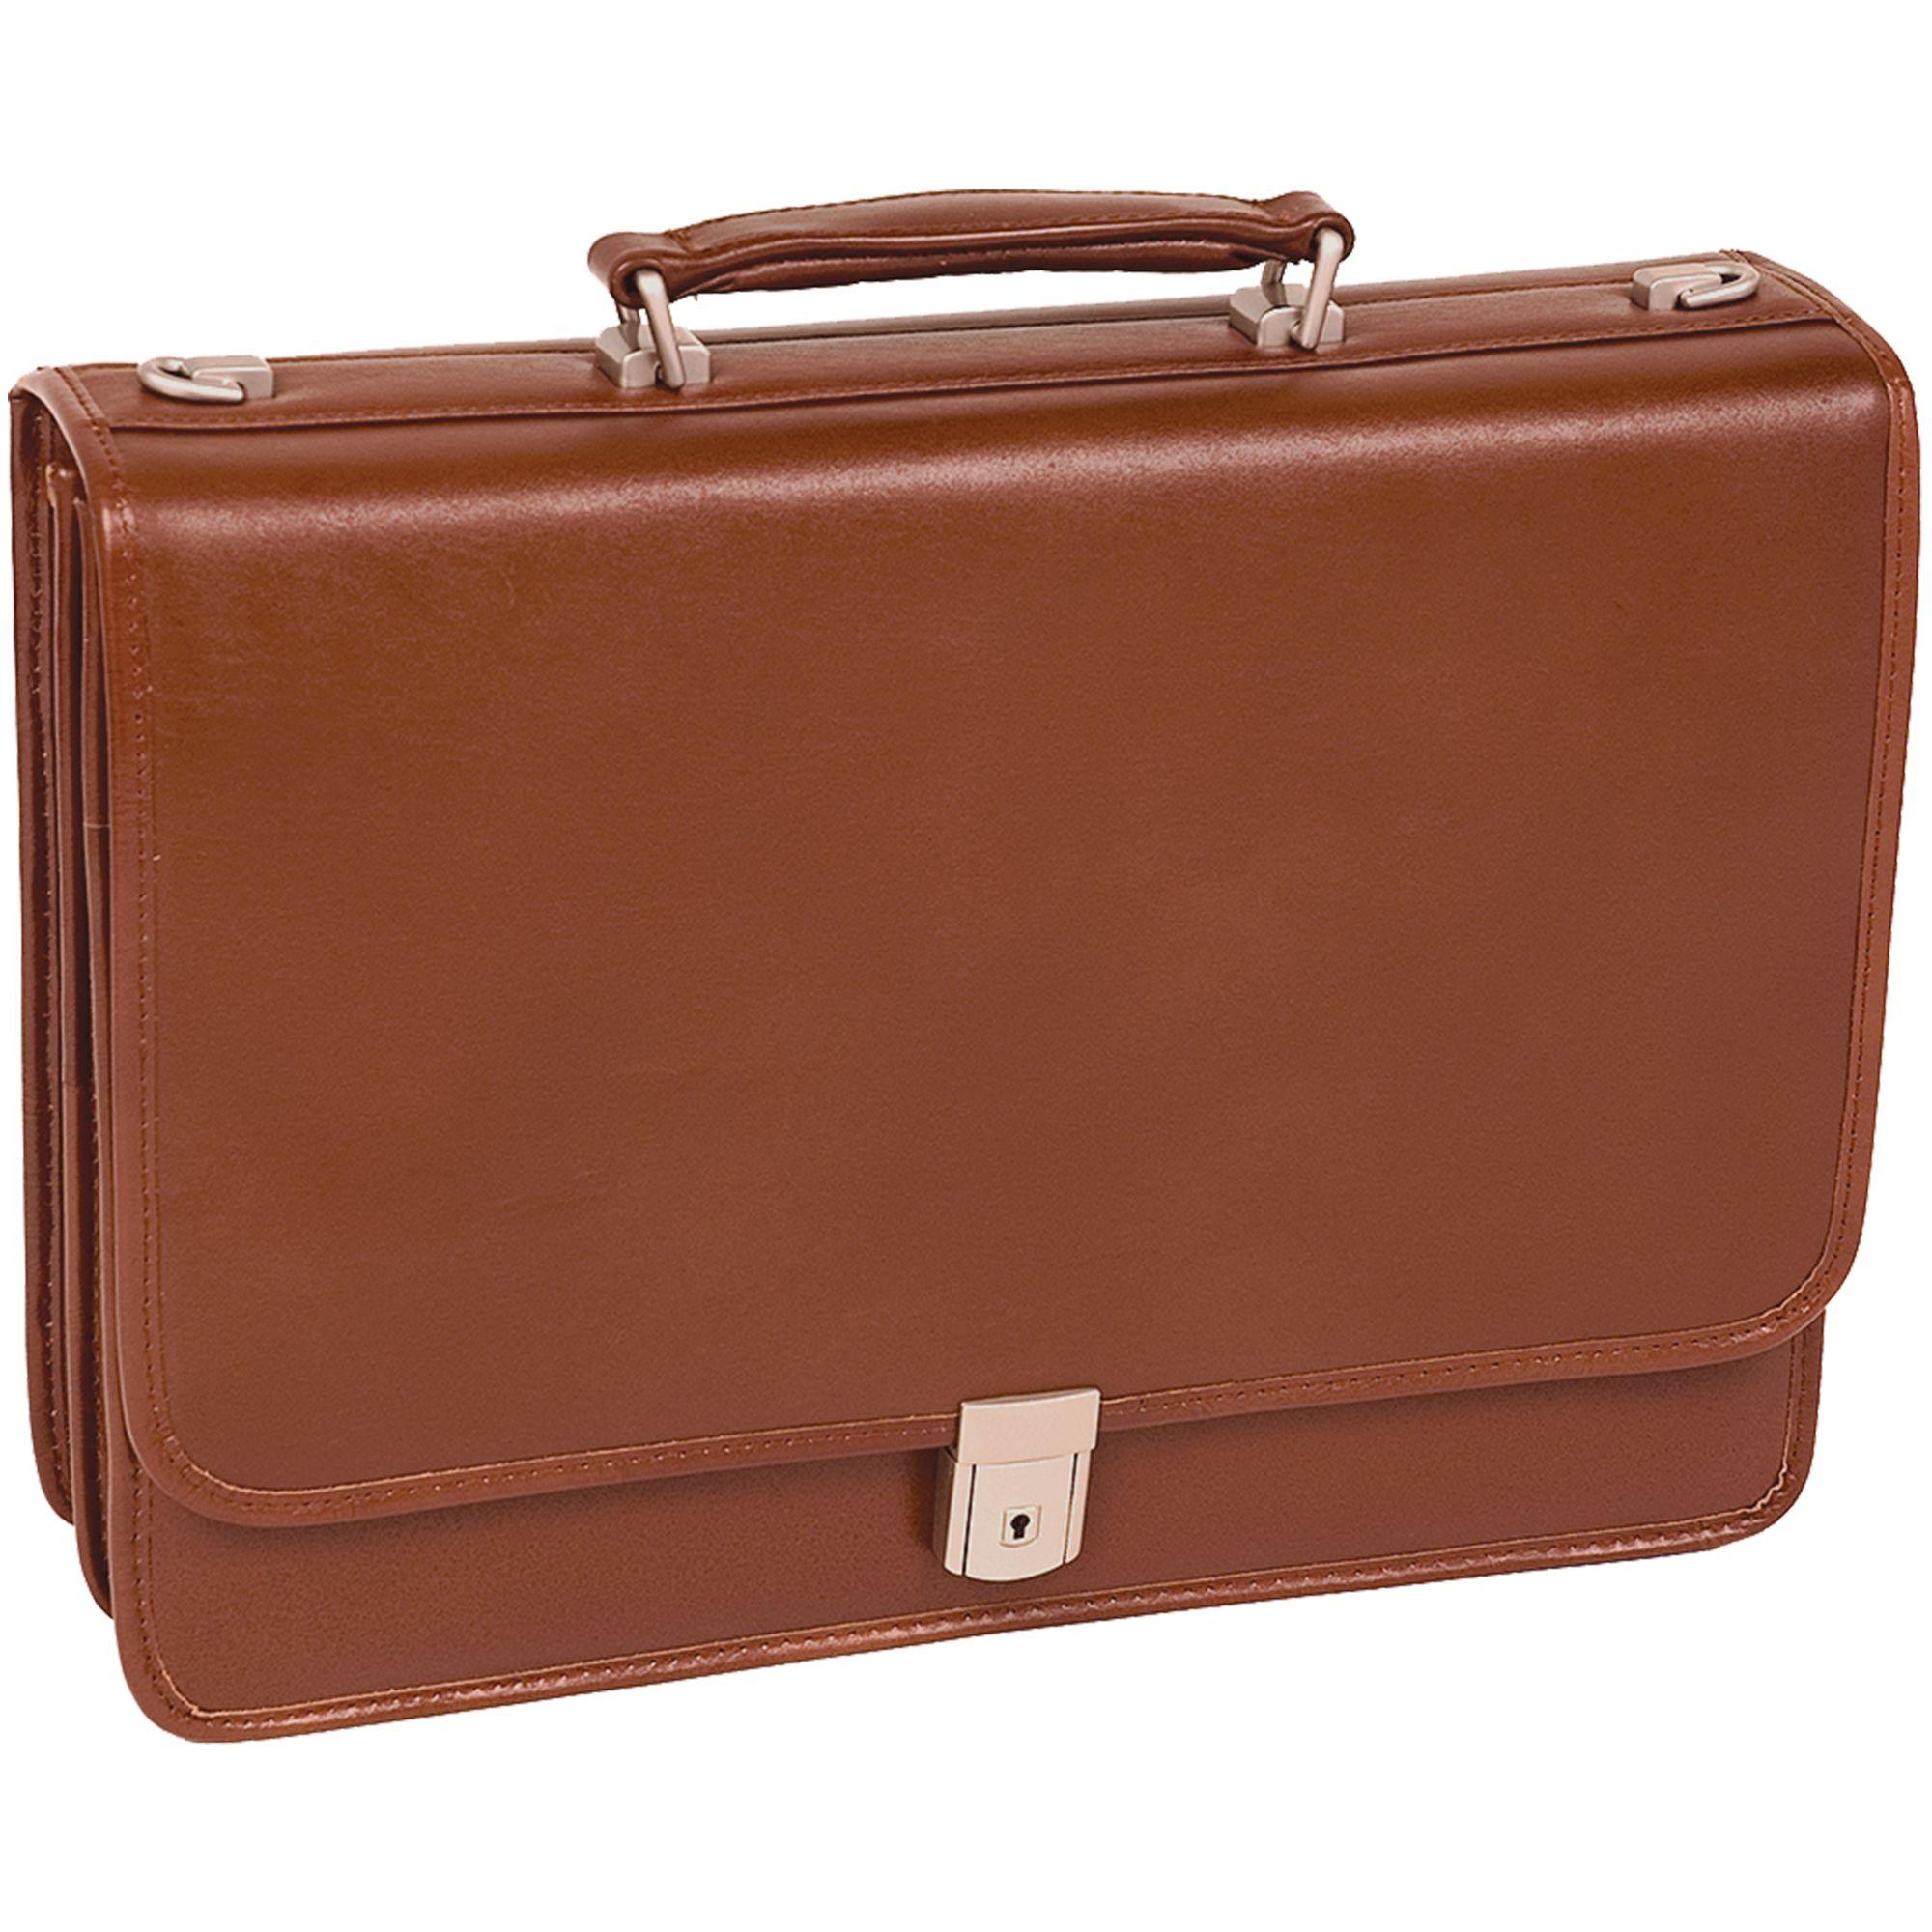 McKlein® Lexington 83544 black flapover double compartment briefcase, Brown